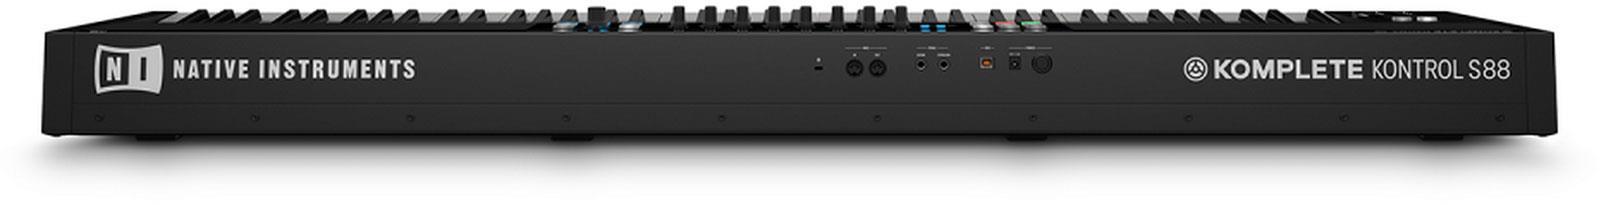 TECLADO CONTROLADOR MIDI NATIVE INSTRUMENTS KOMPLETE KONTROL S88